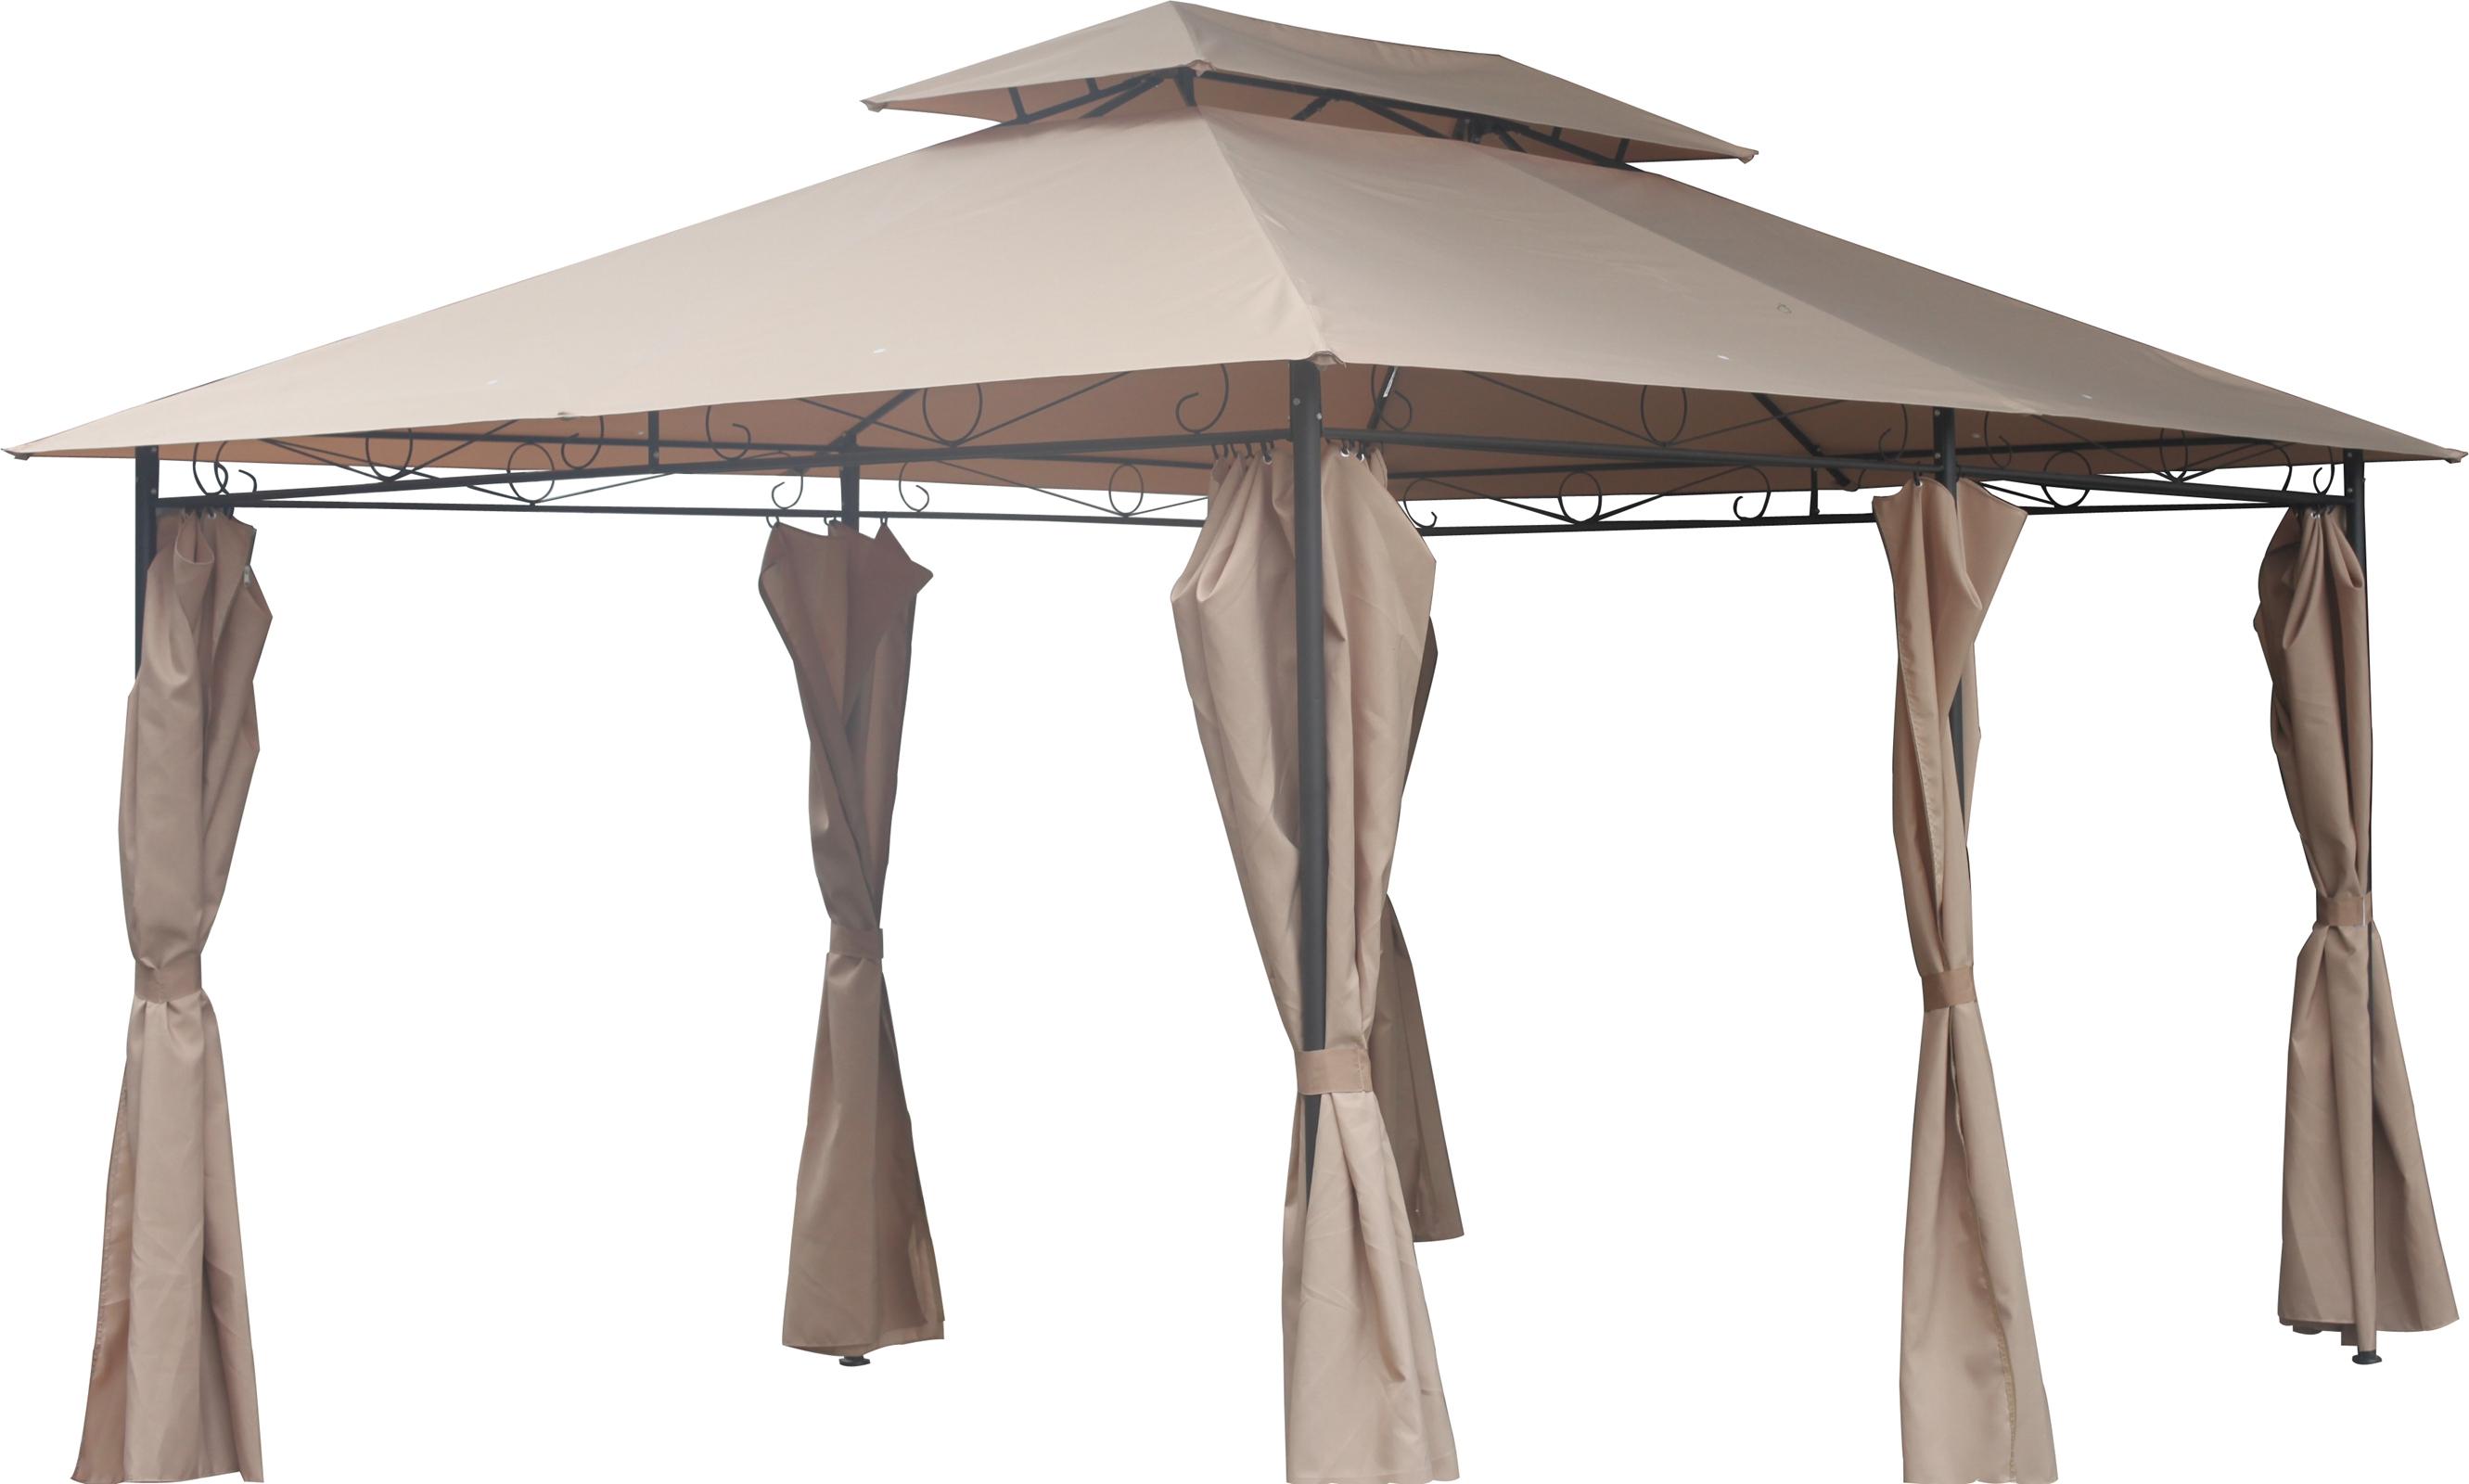 Foxhunter 3m X 4m Garden Pavilion Gazebo Shelter